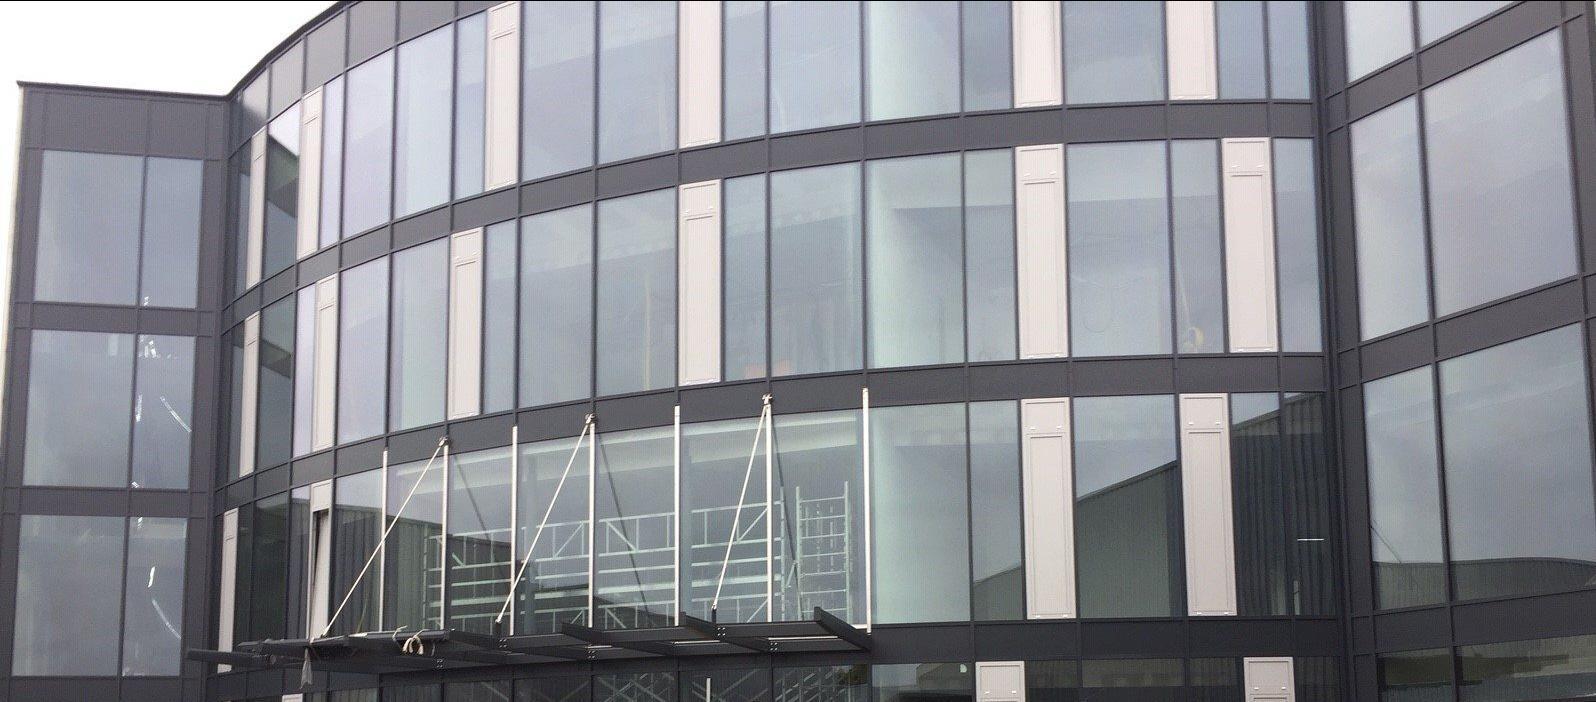 Bureaux 51,5m² dans un immeuble neuf à Bischheim